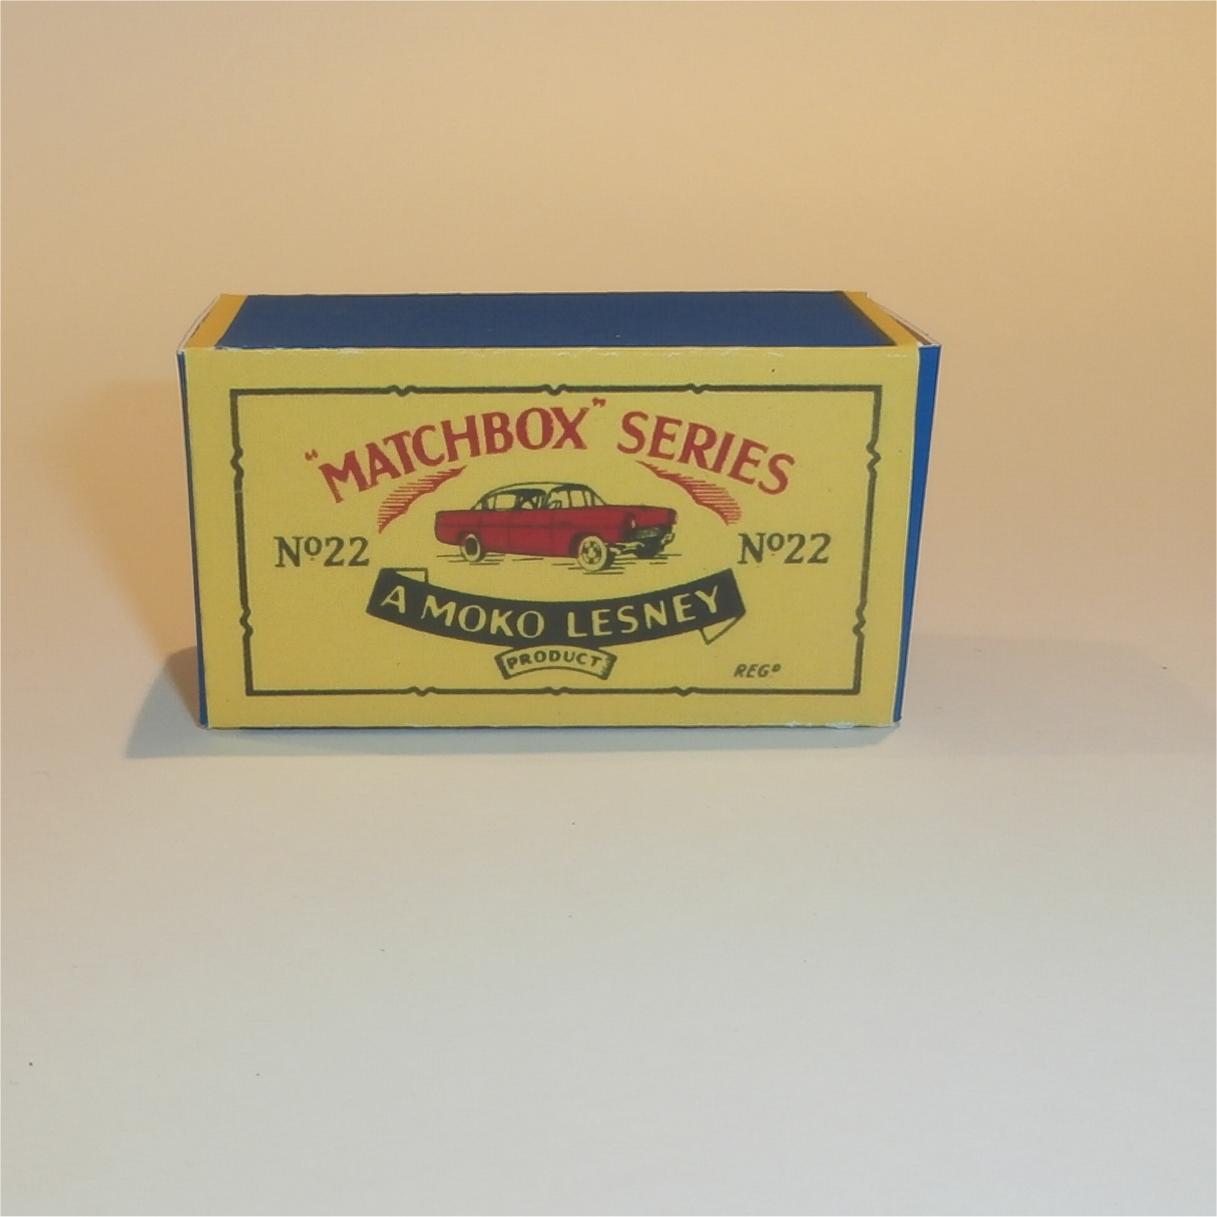 Repro box MATCHBOX 1:75 Nº 22 vauxhall CRESTA